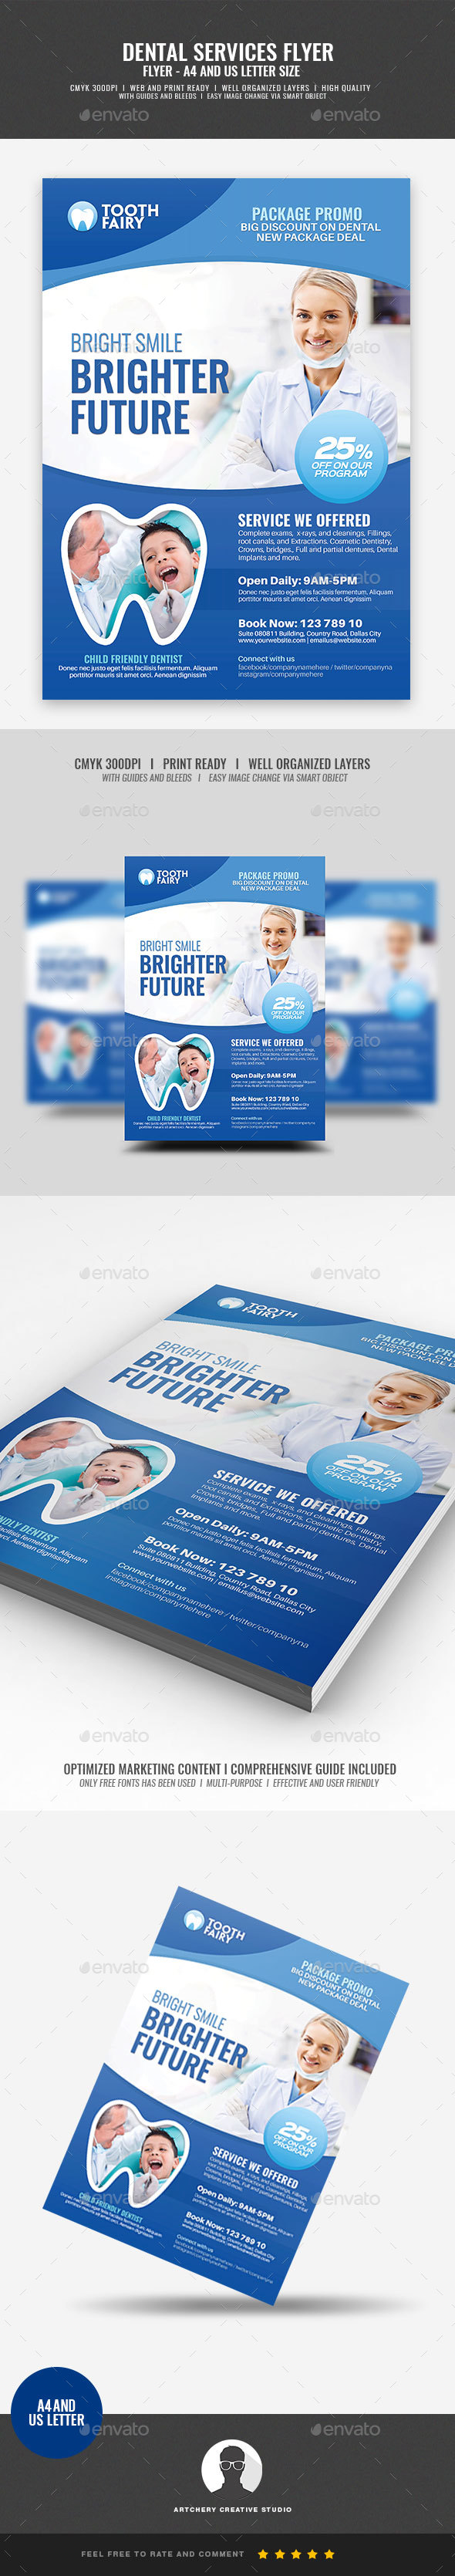 Dentist Dental Services Flyer - Corporate Flyers